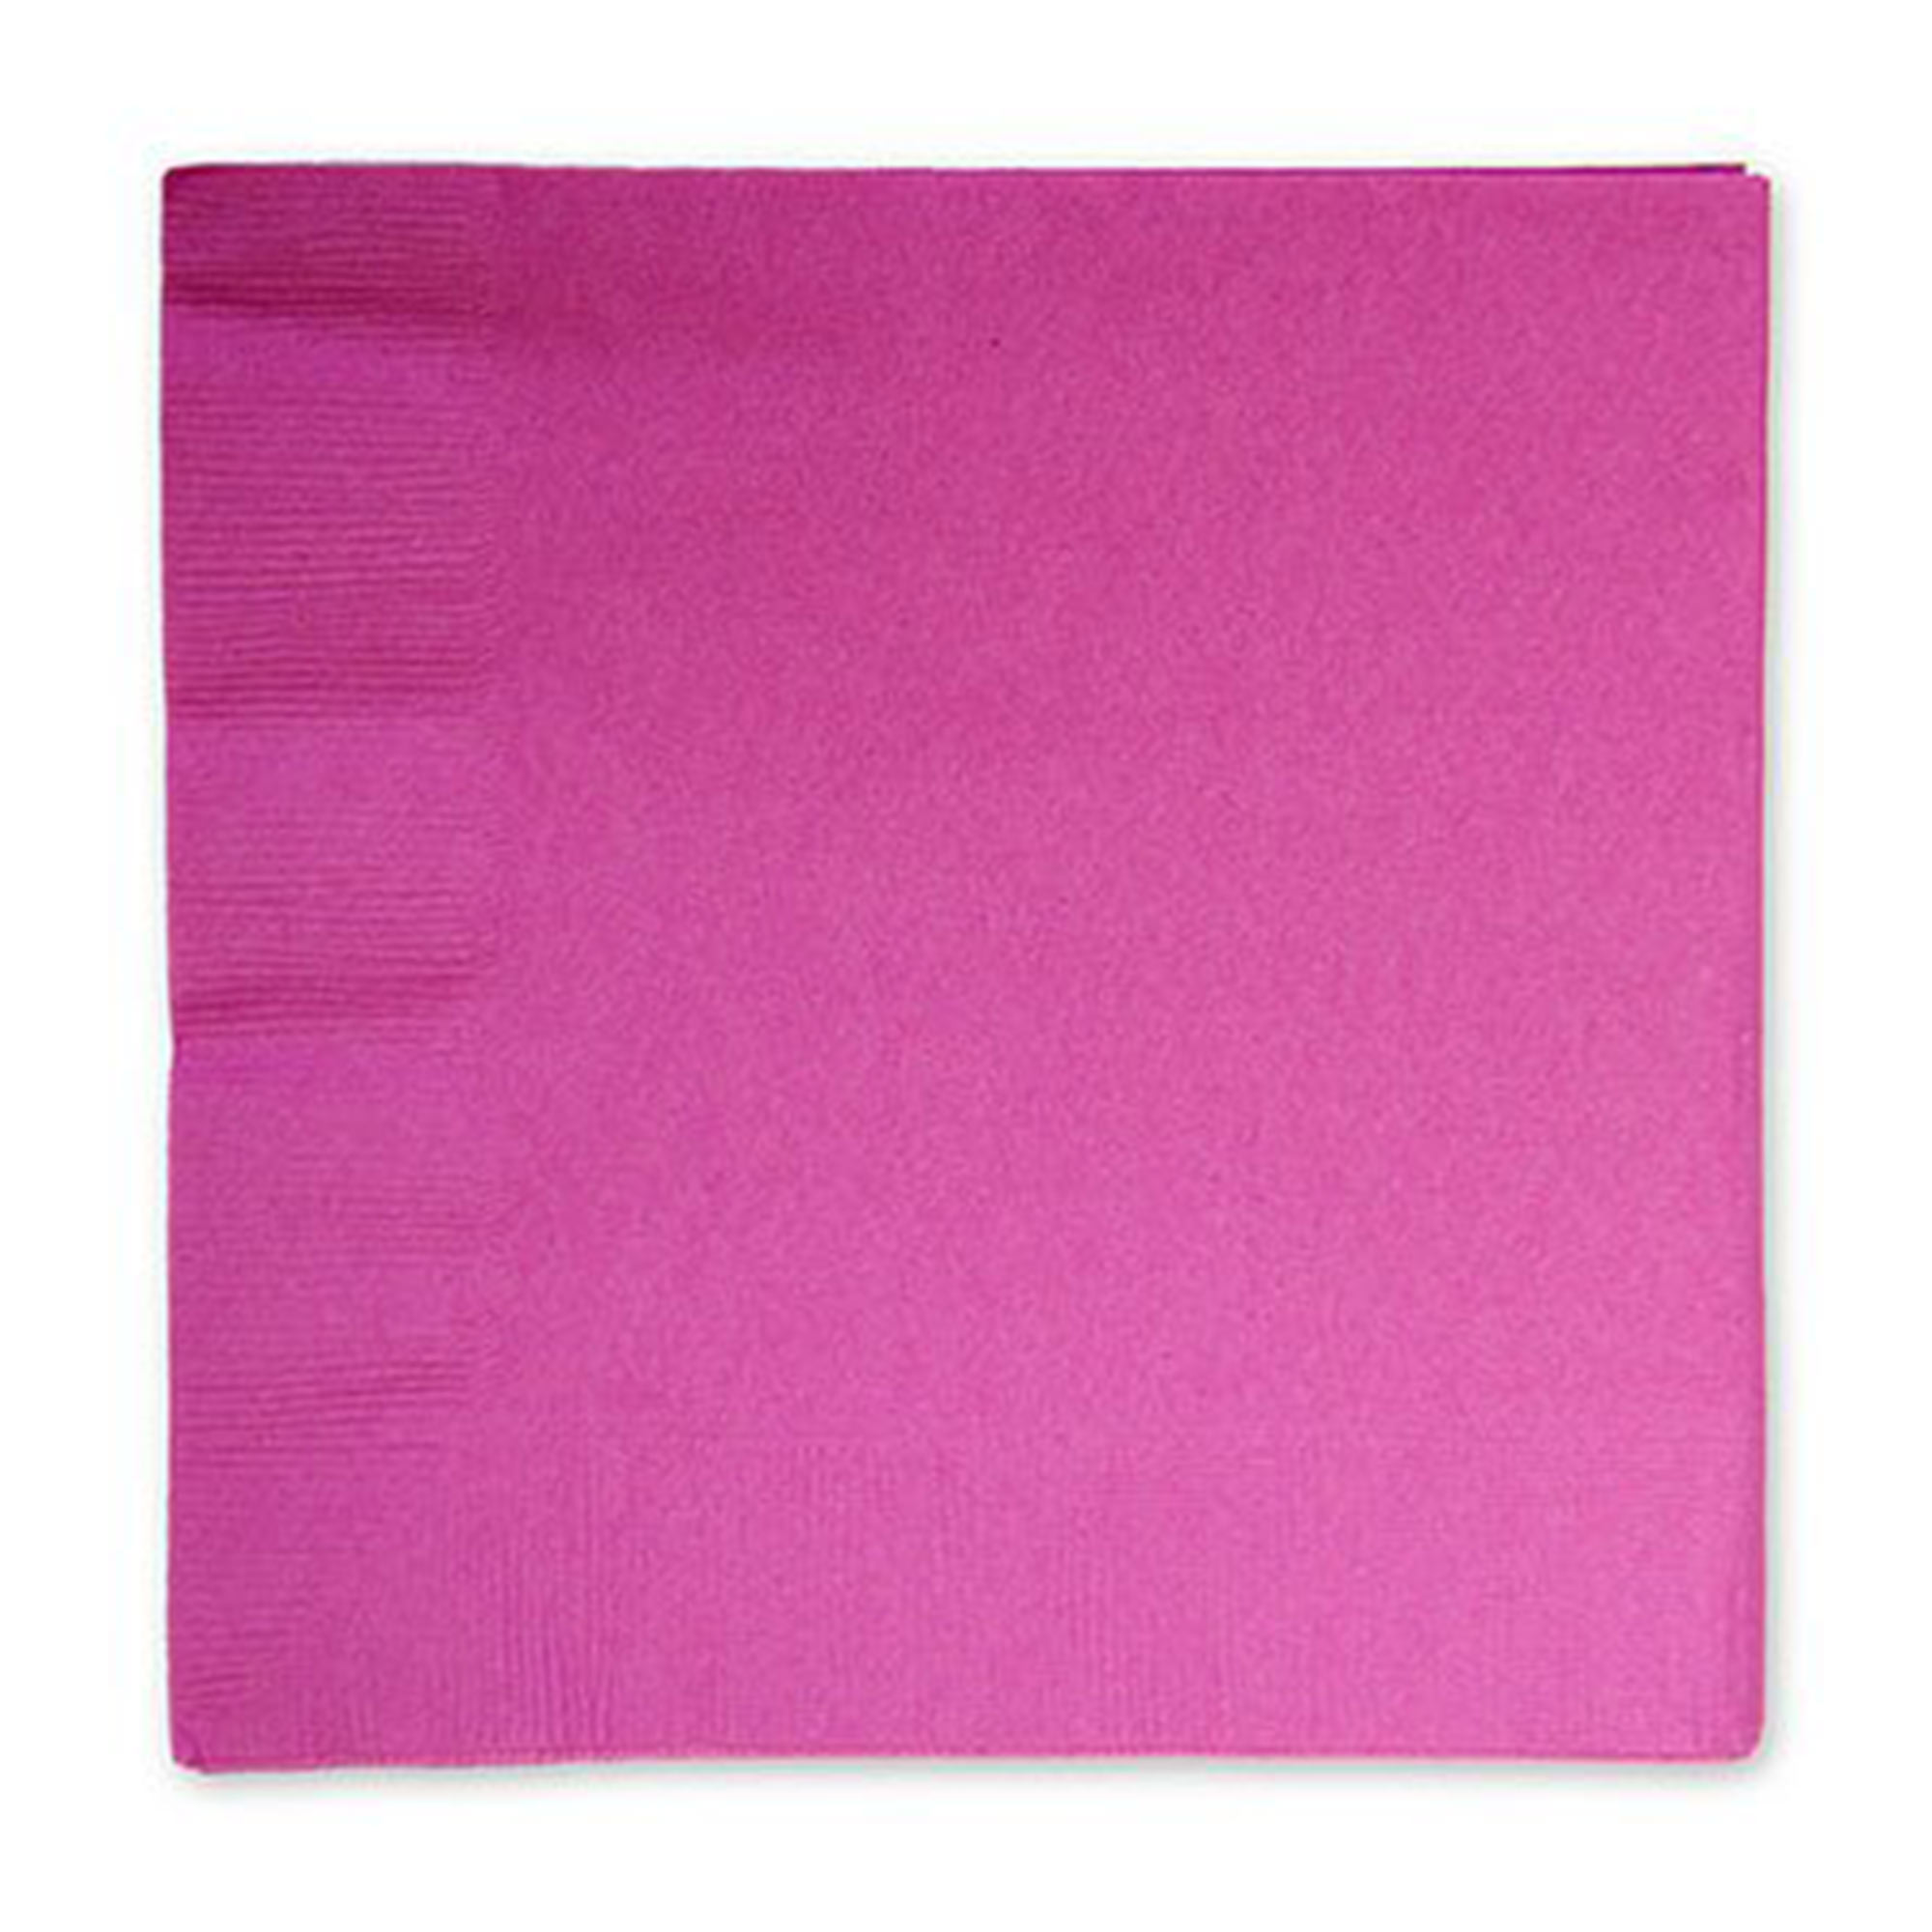 Фото - Салфетки Amscan Bright Pink 33 см 16 шт спирали amscan пастель 55 см 12 шт